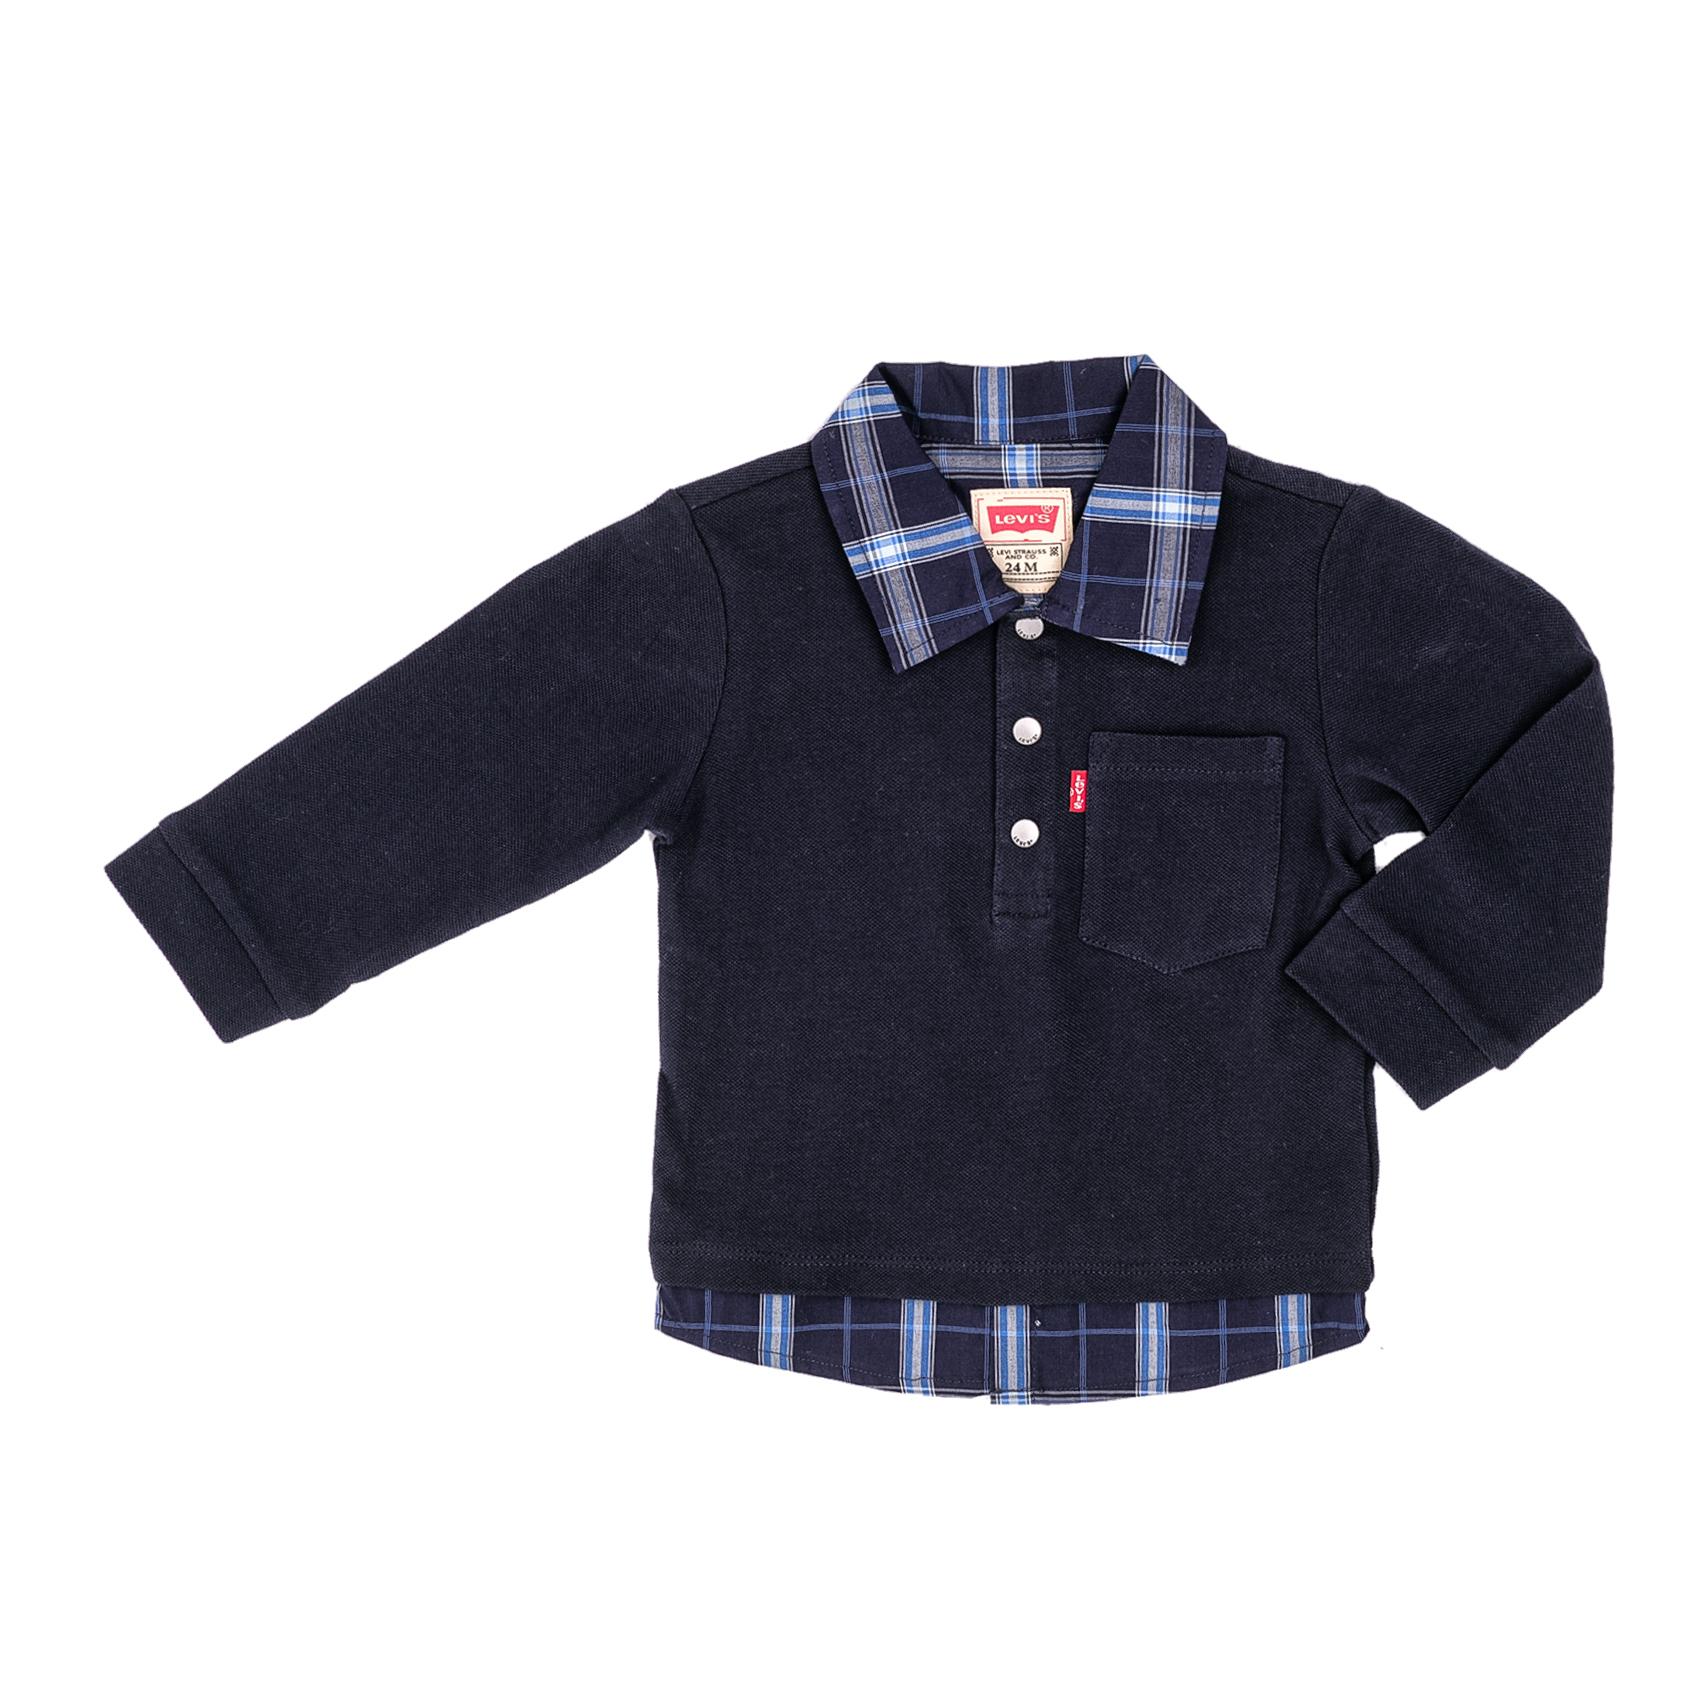 LEVI'S KIDS – Παιδική μπλούζα πόλο LEVI'S KIDS μπλε